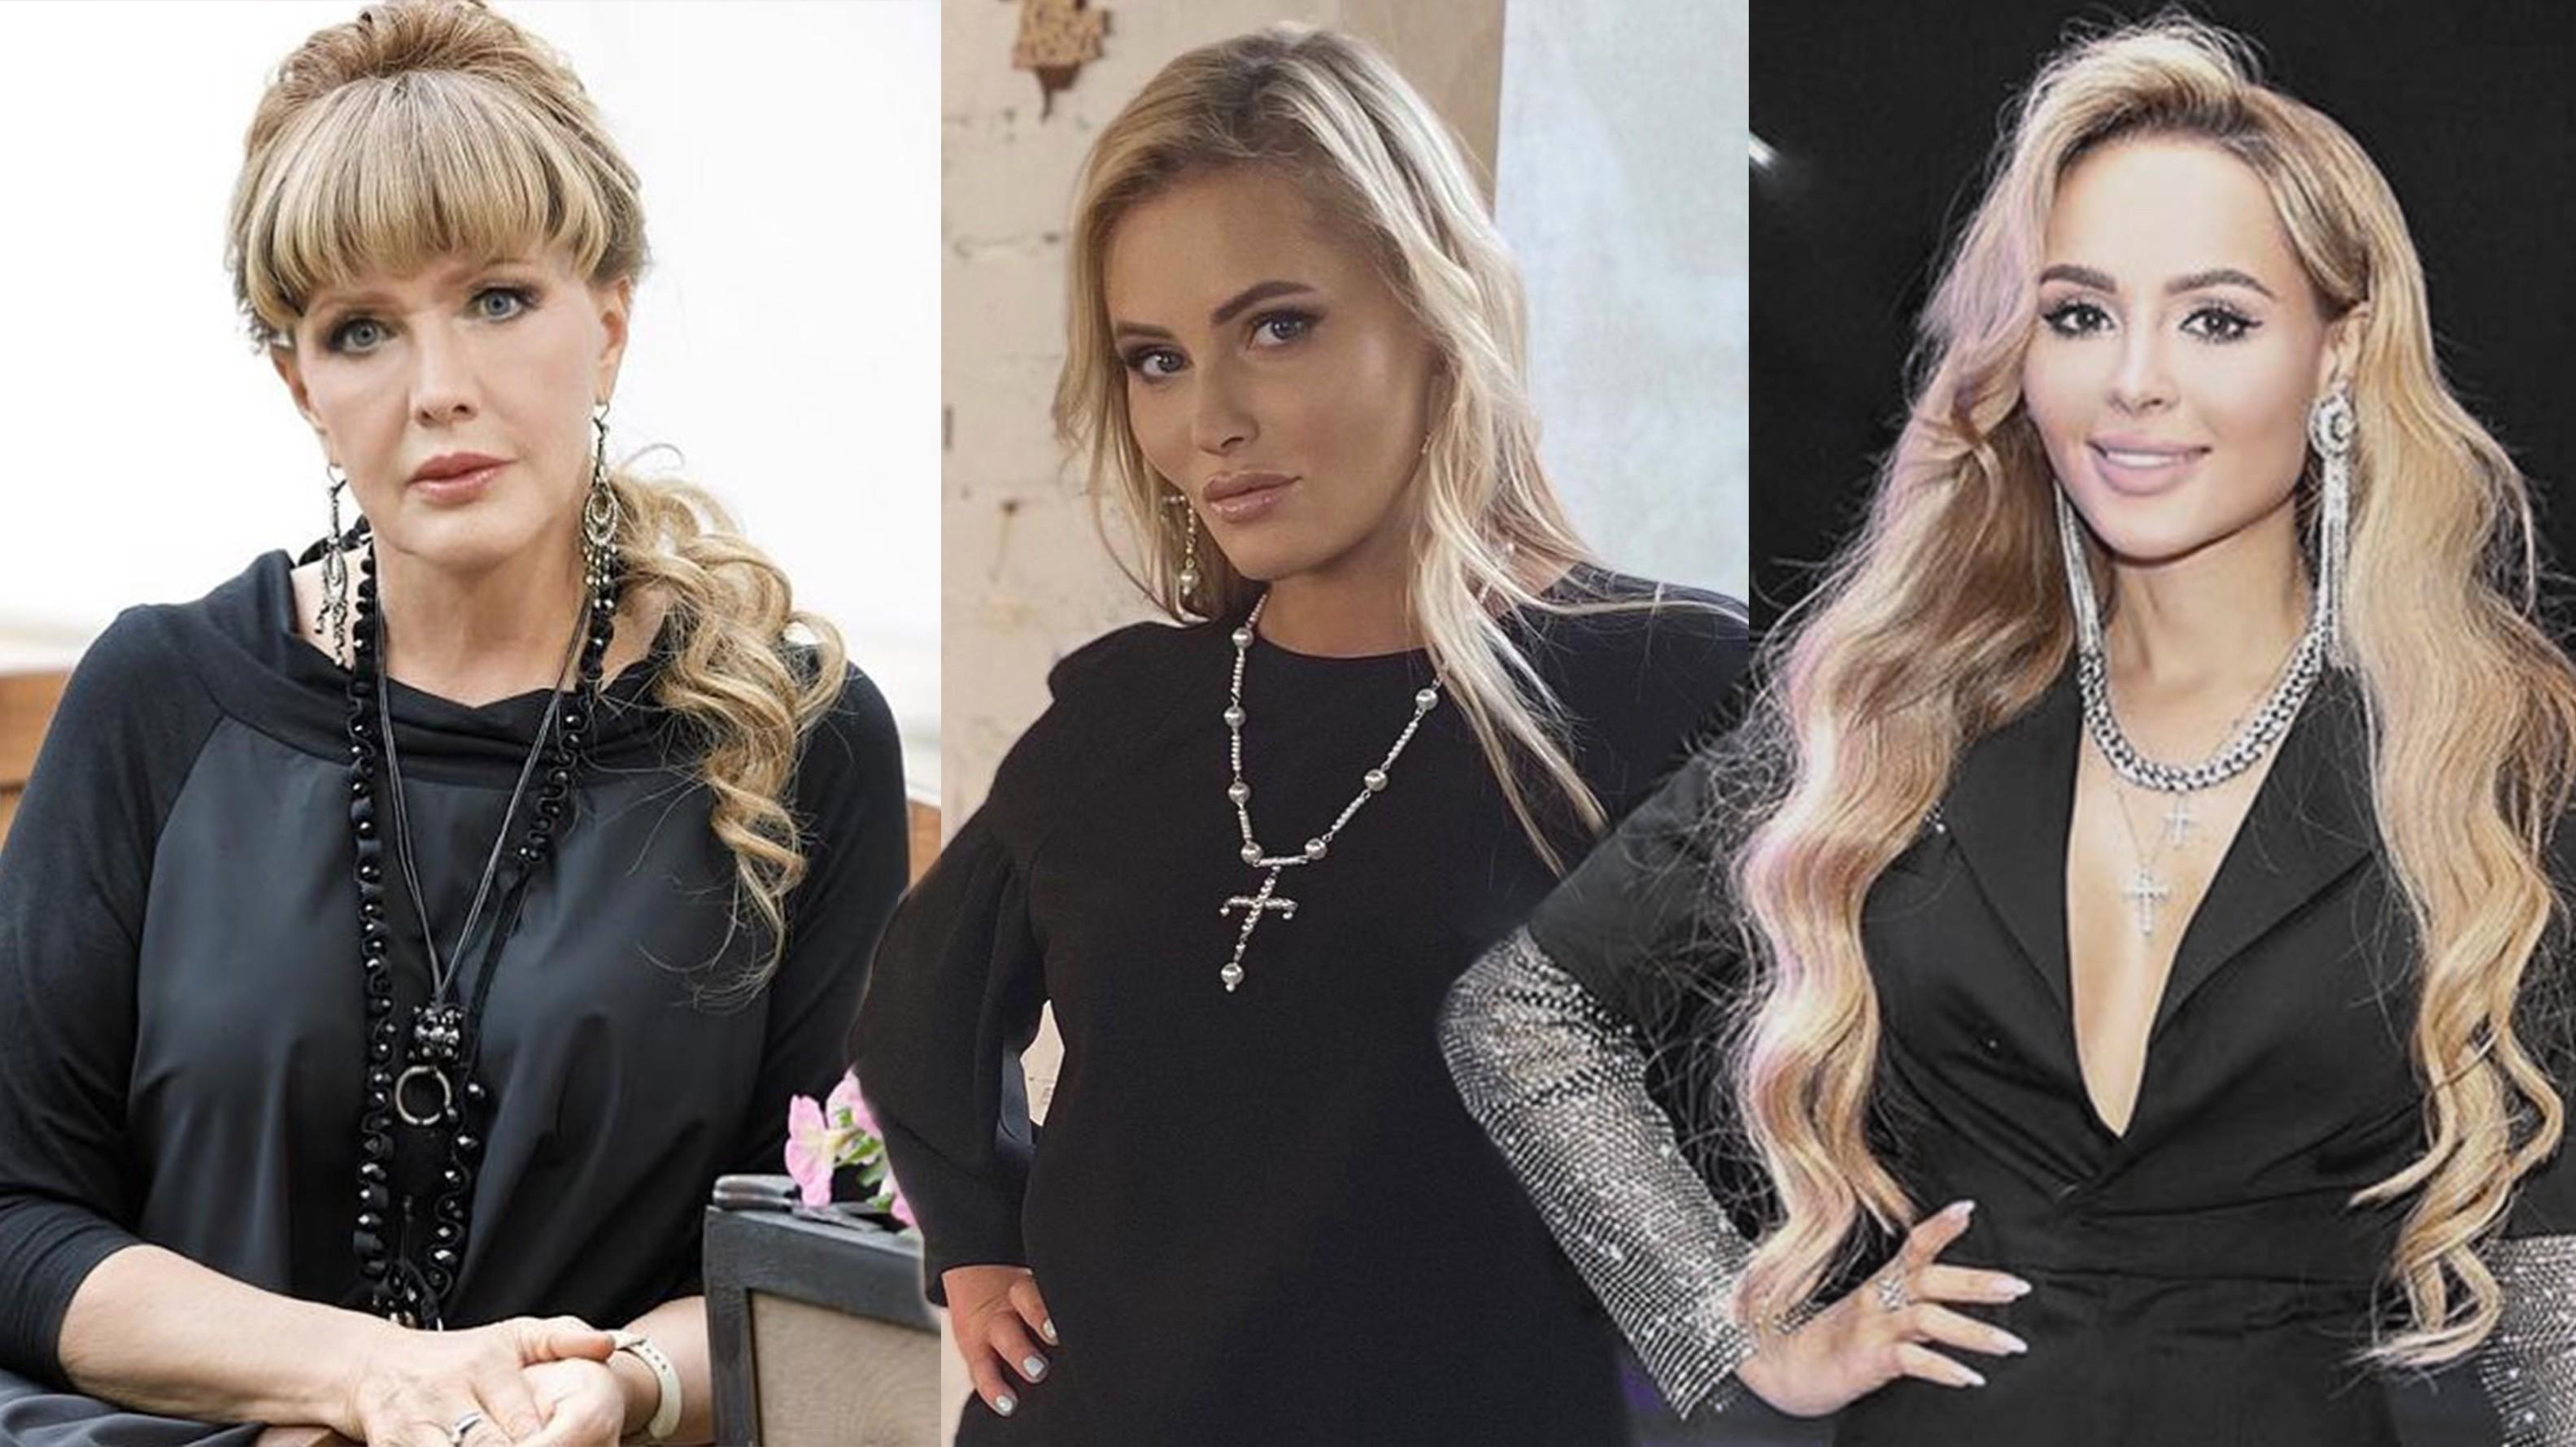 Проклова, Борисова, Калашникова: почему звезды заговорили о харассменте сейчас?